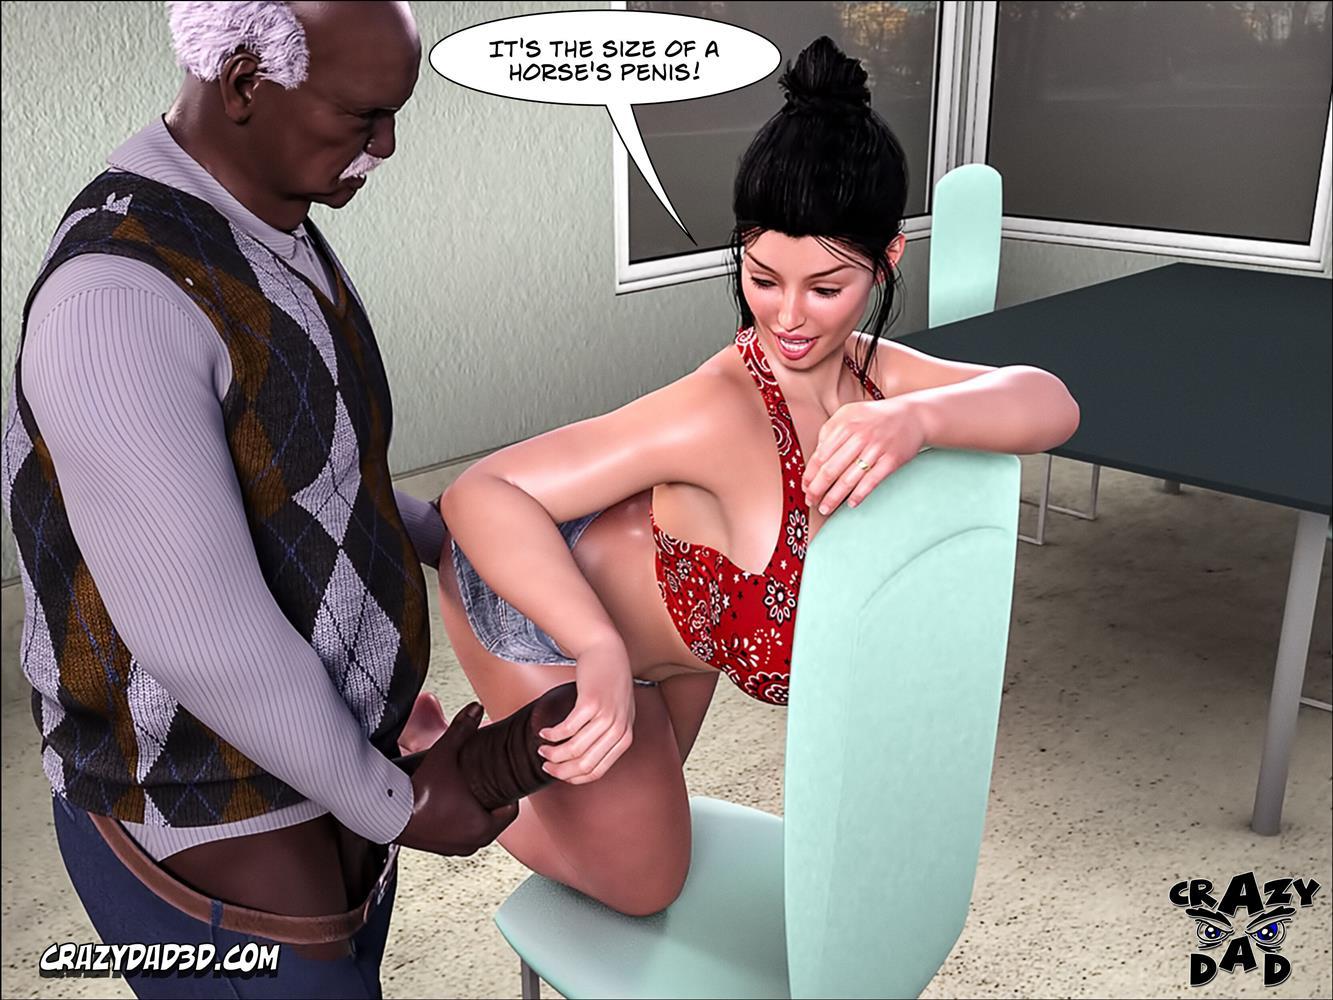 Mom's Help 16 [Crazy Dad 3D] - Foto 71